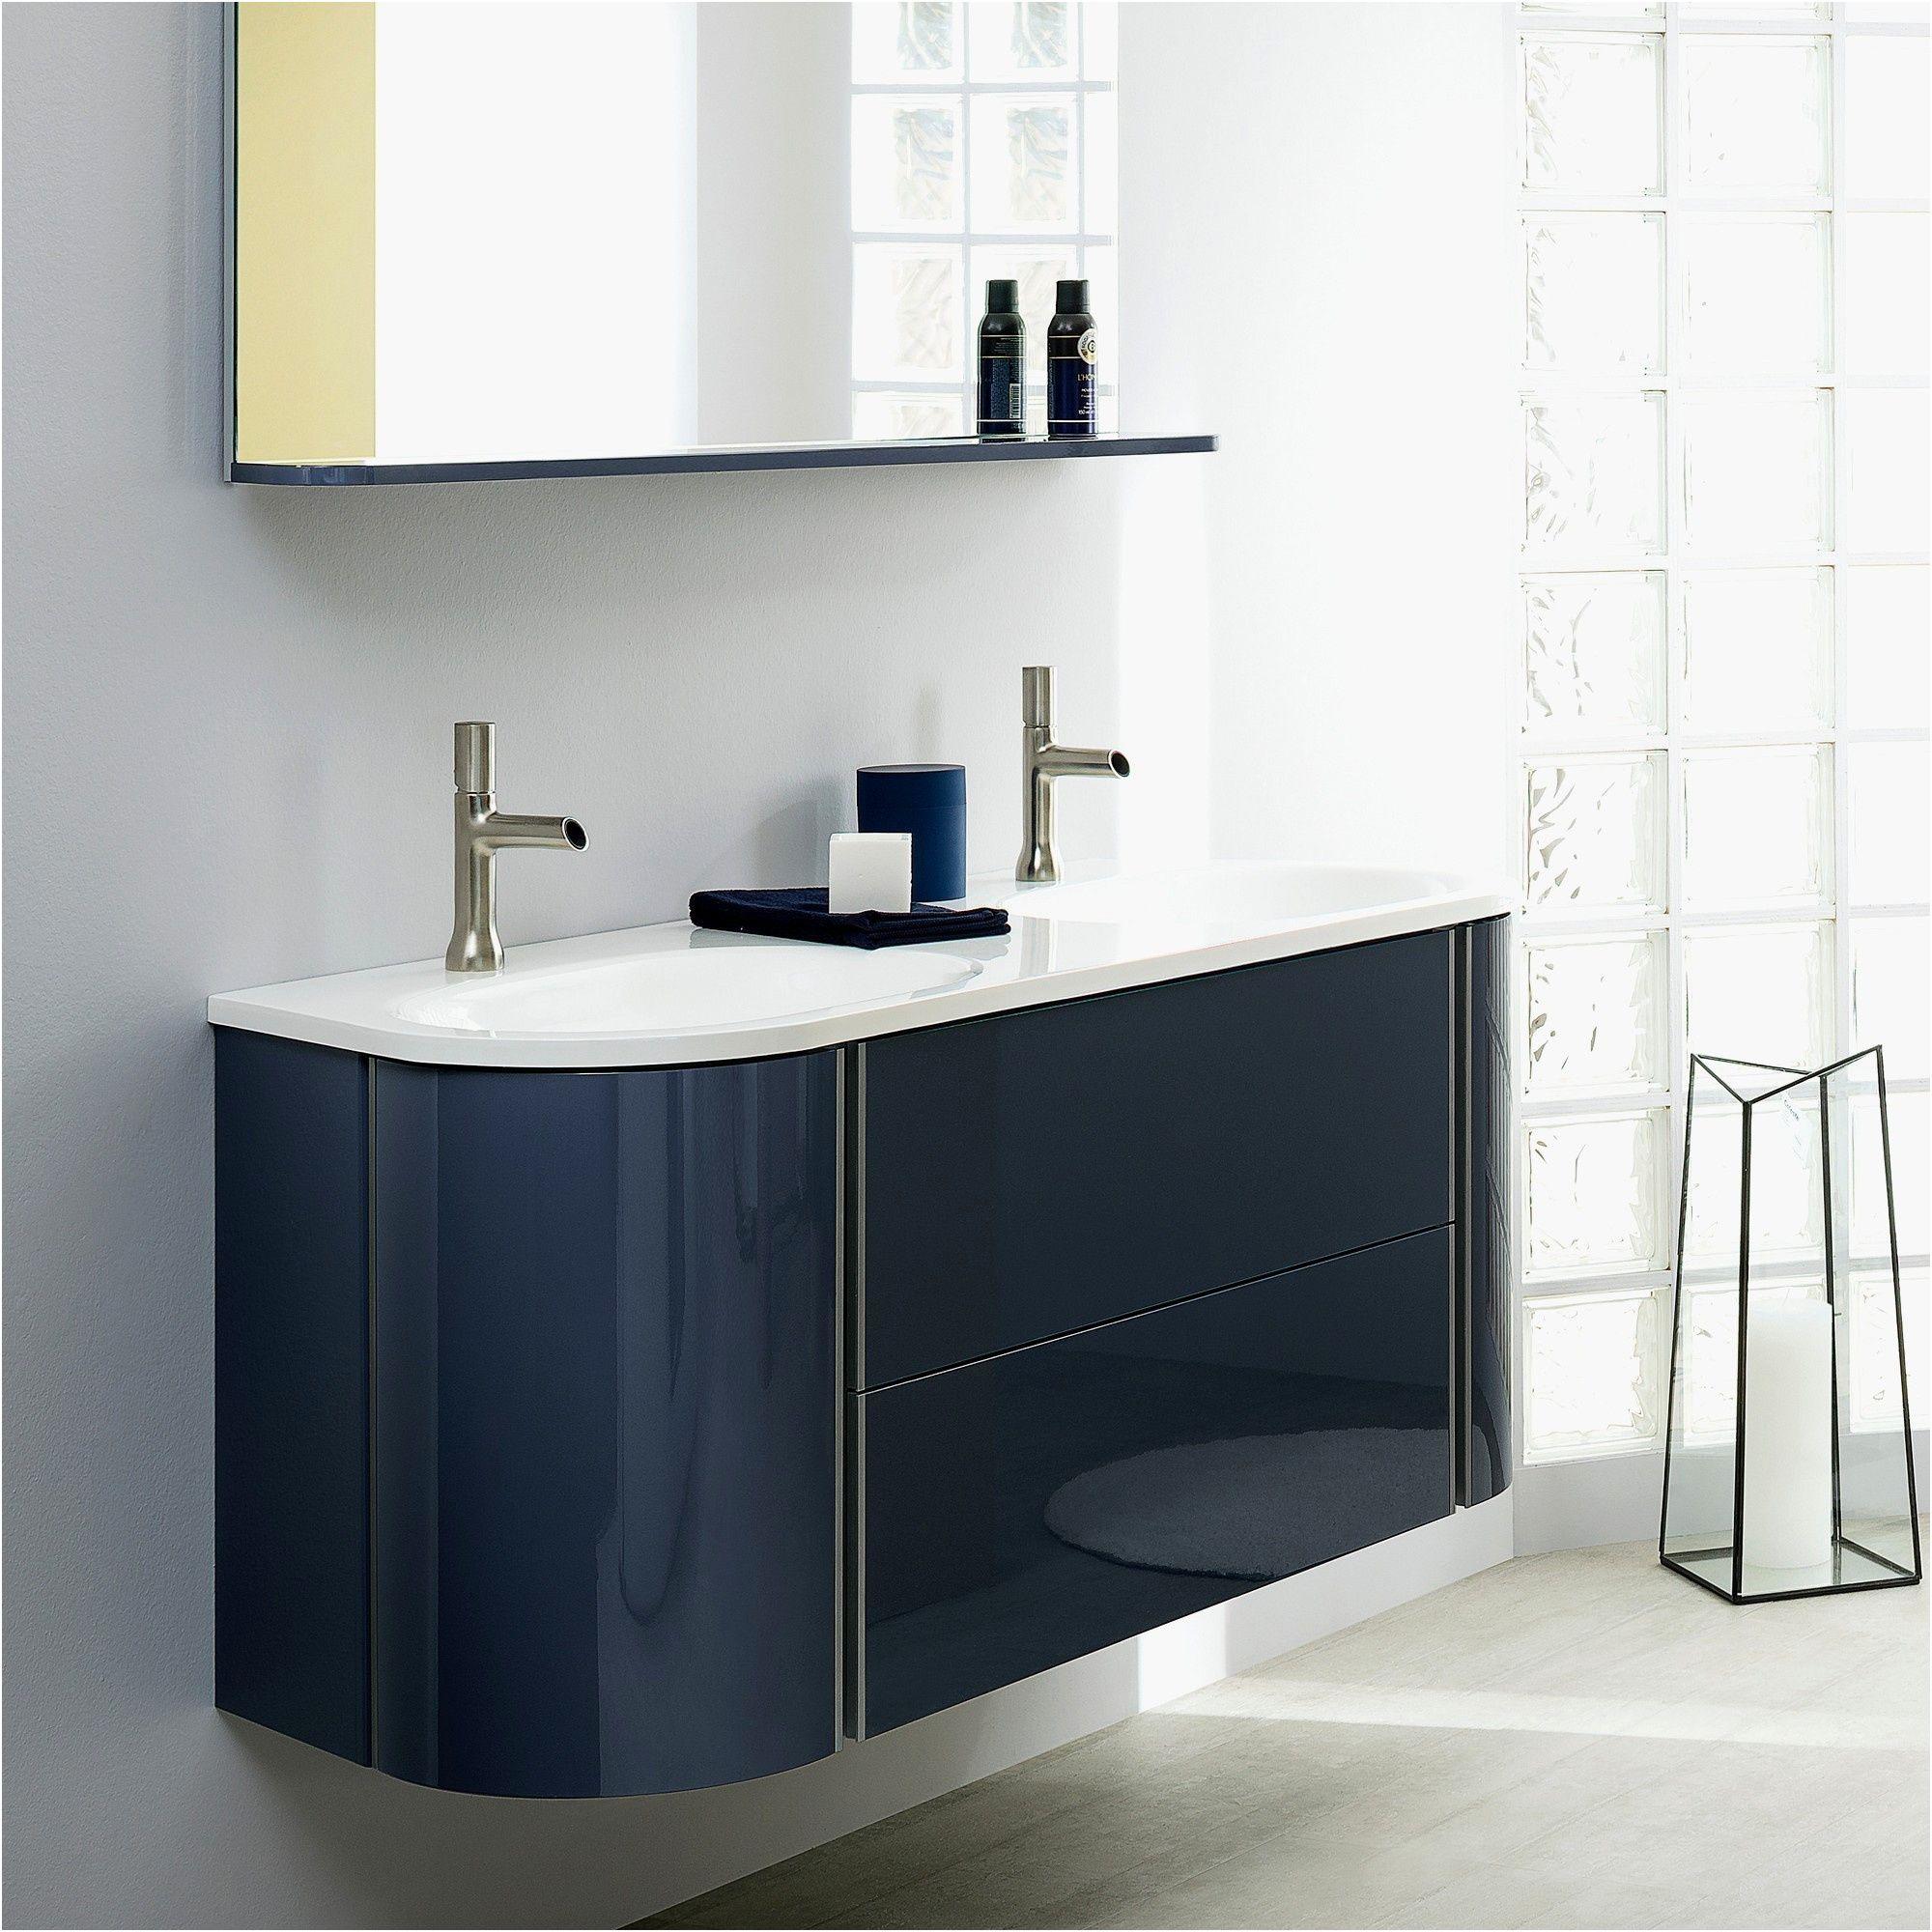 8 Utile Meuble Salle De Bain Double Vasque 100 Cm In 2020 Wash Basin House Design Single Vanity